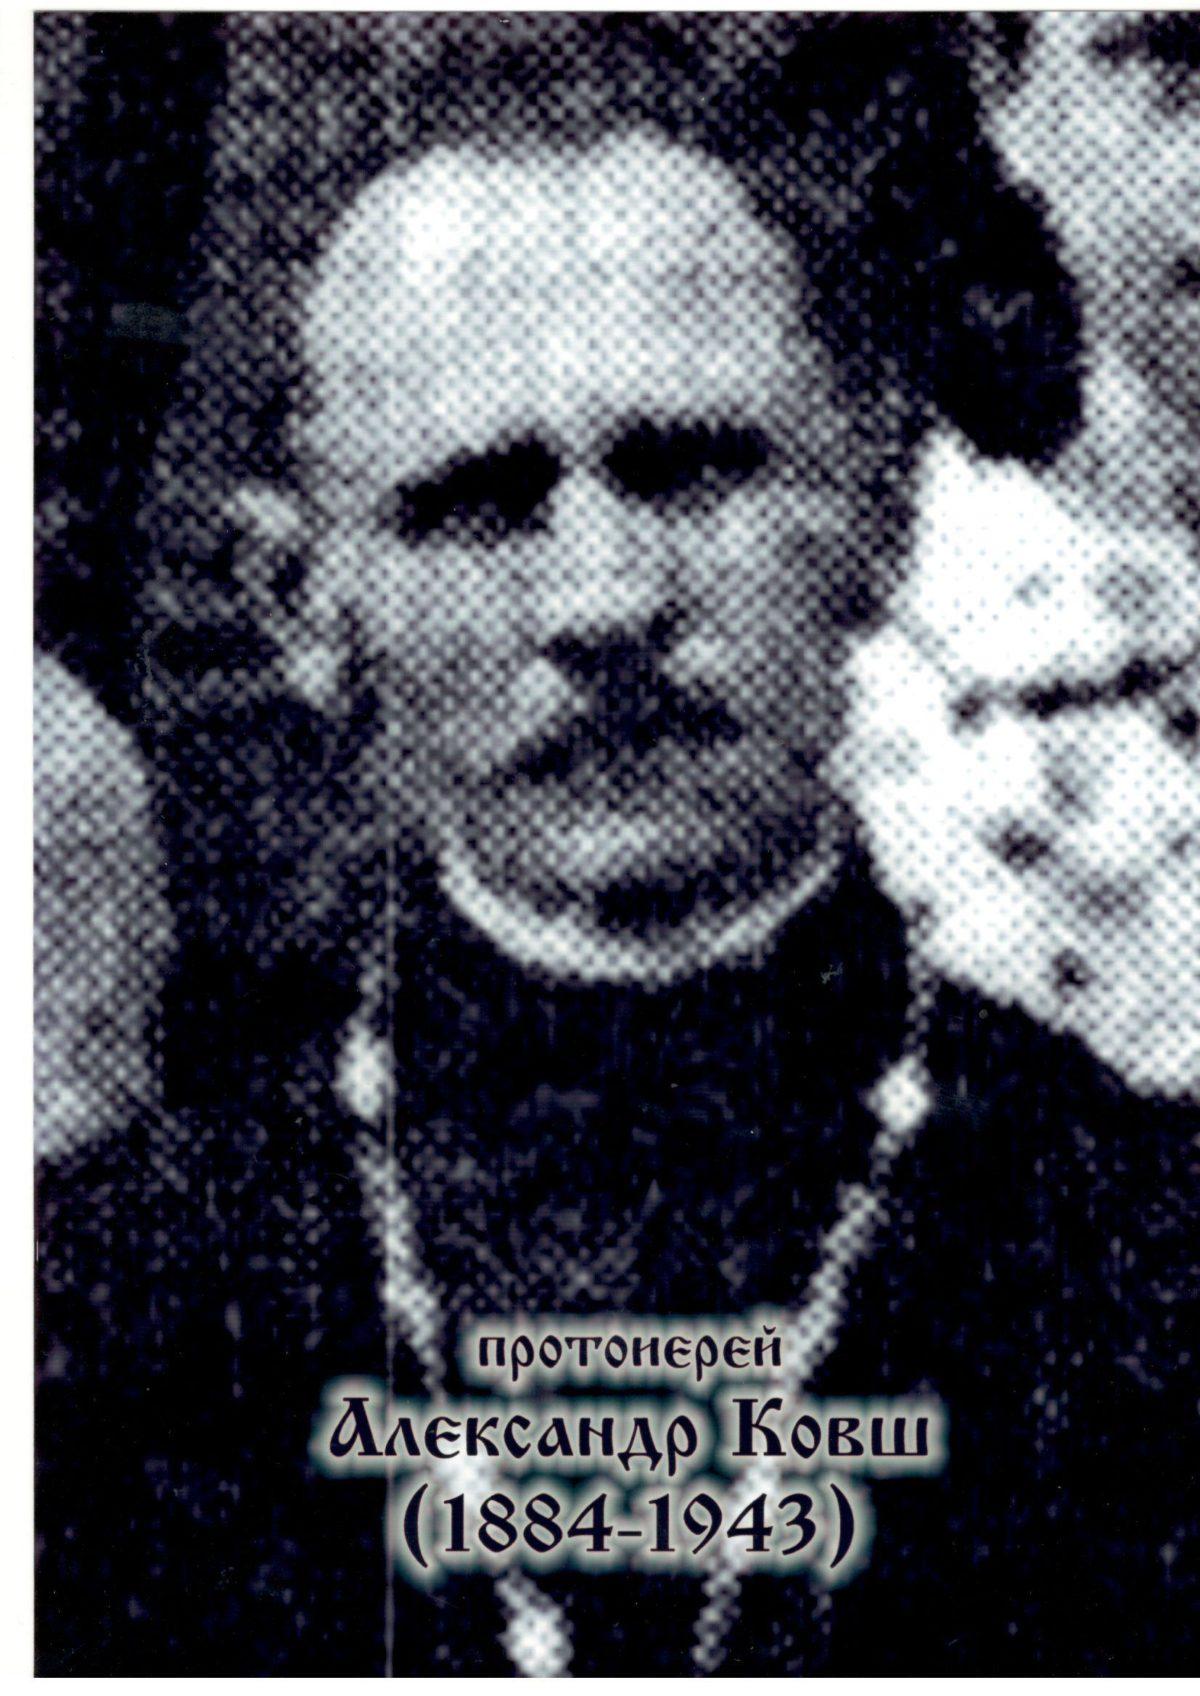 Протоиерей Александр Ковш